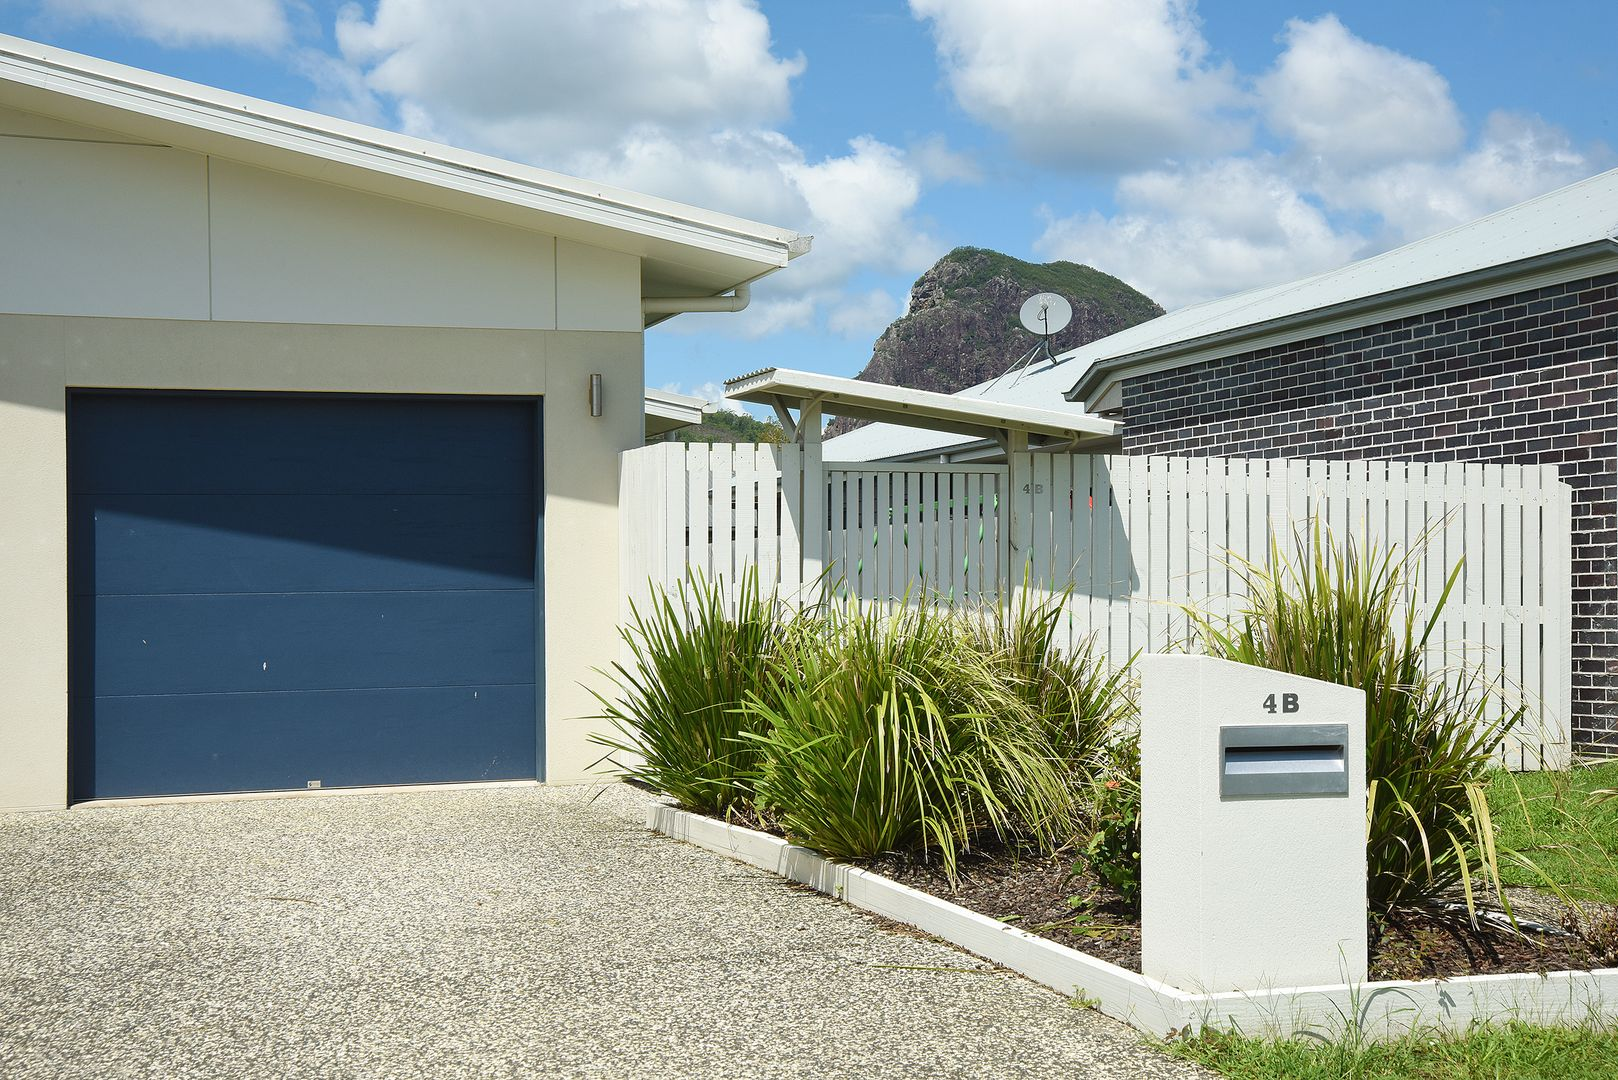 4b Sairs Street, Glass House Mountains QLD 4518, Image 0